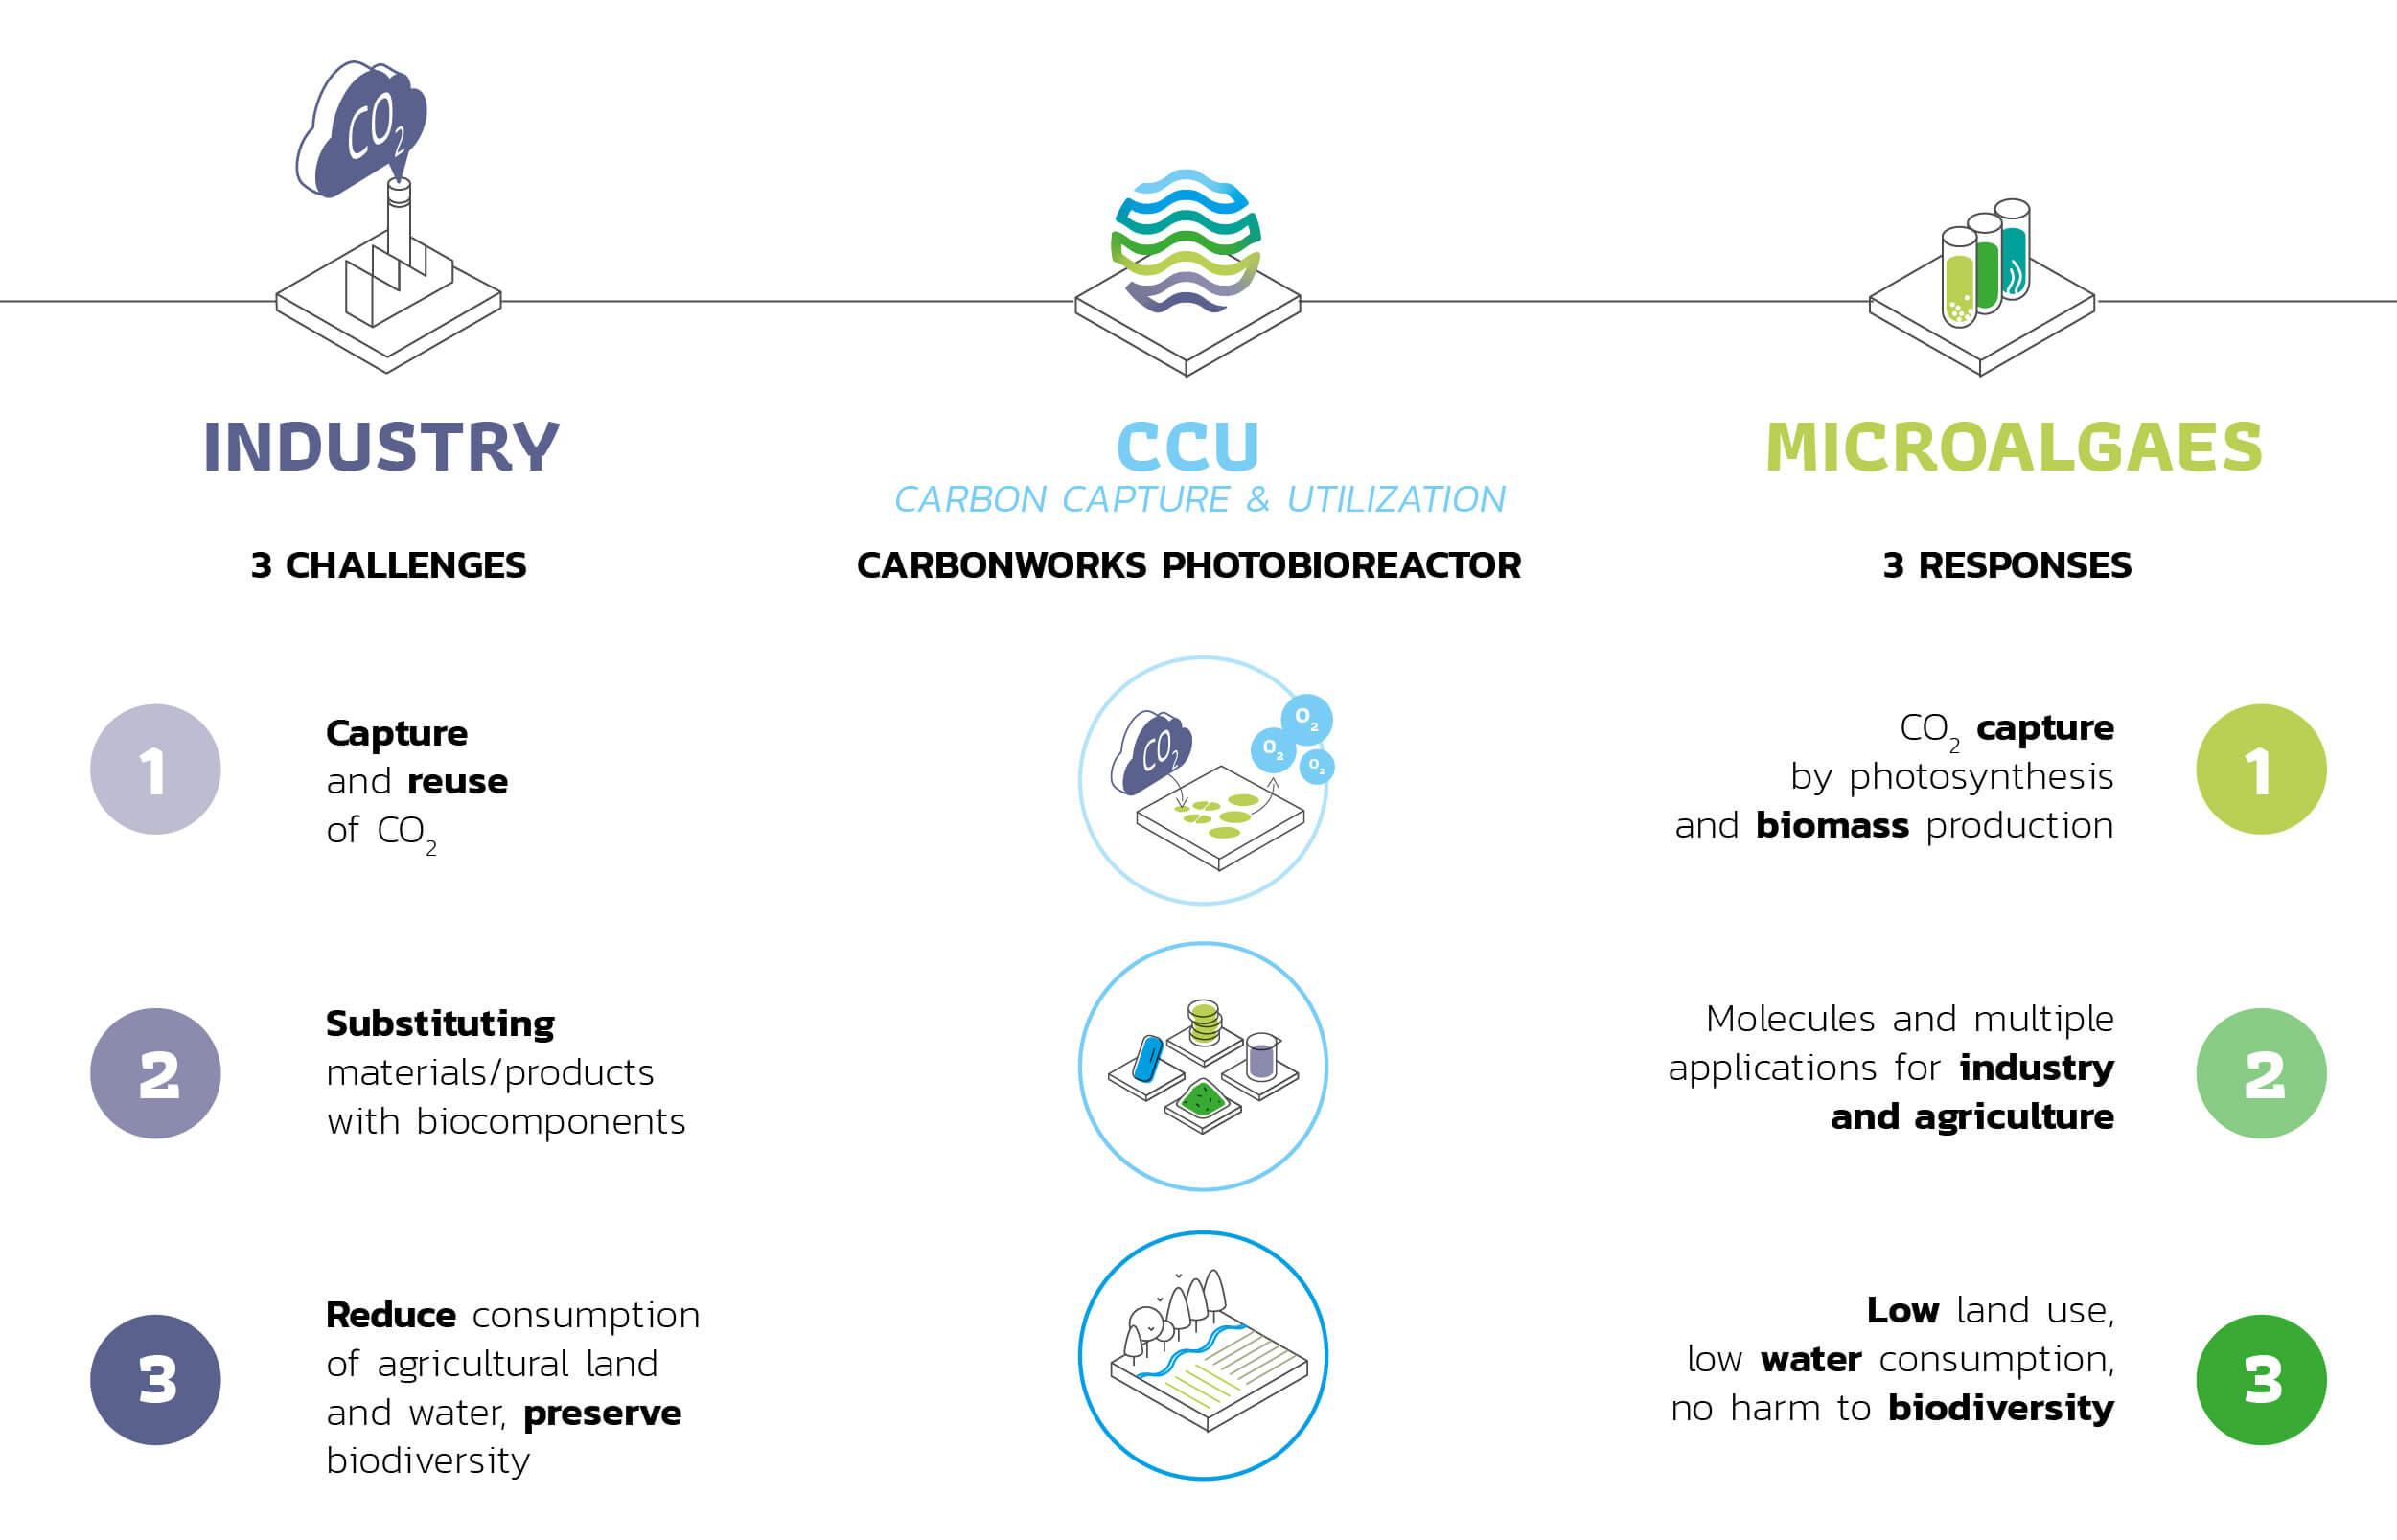 Why microalgaes